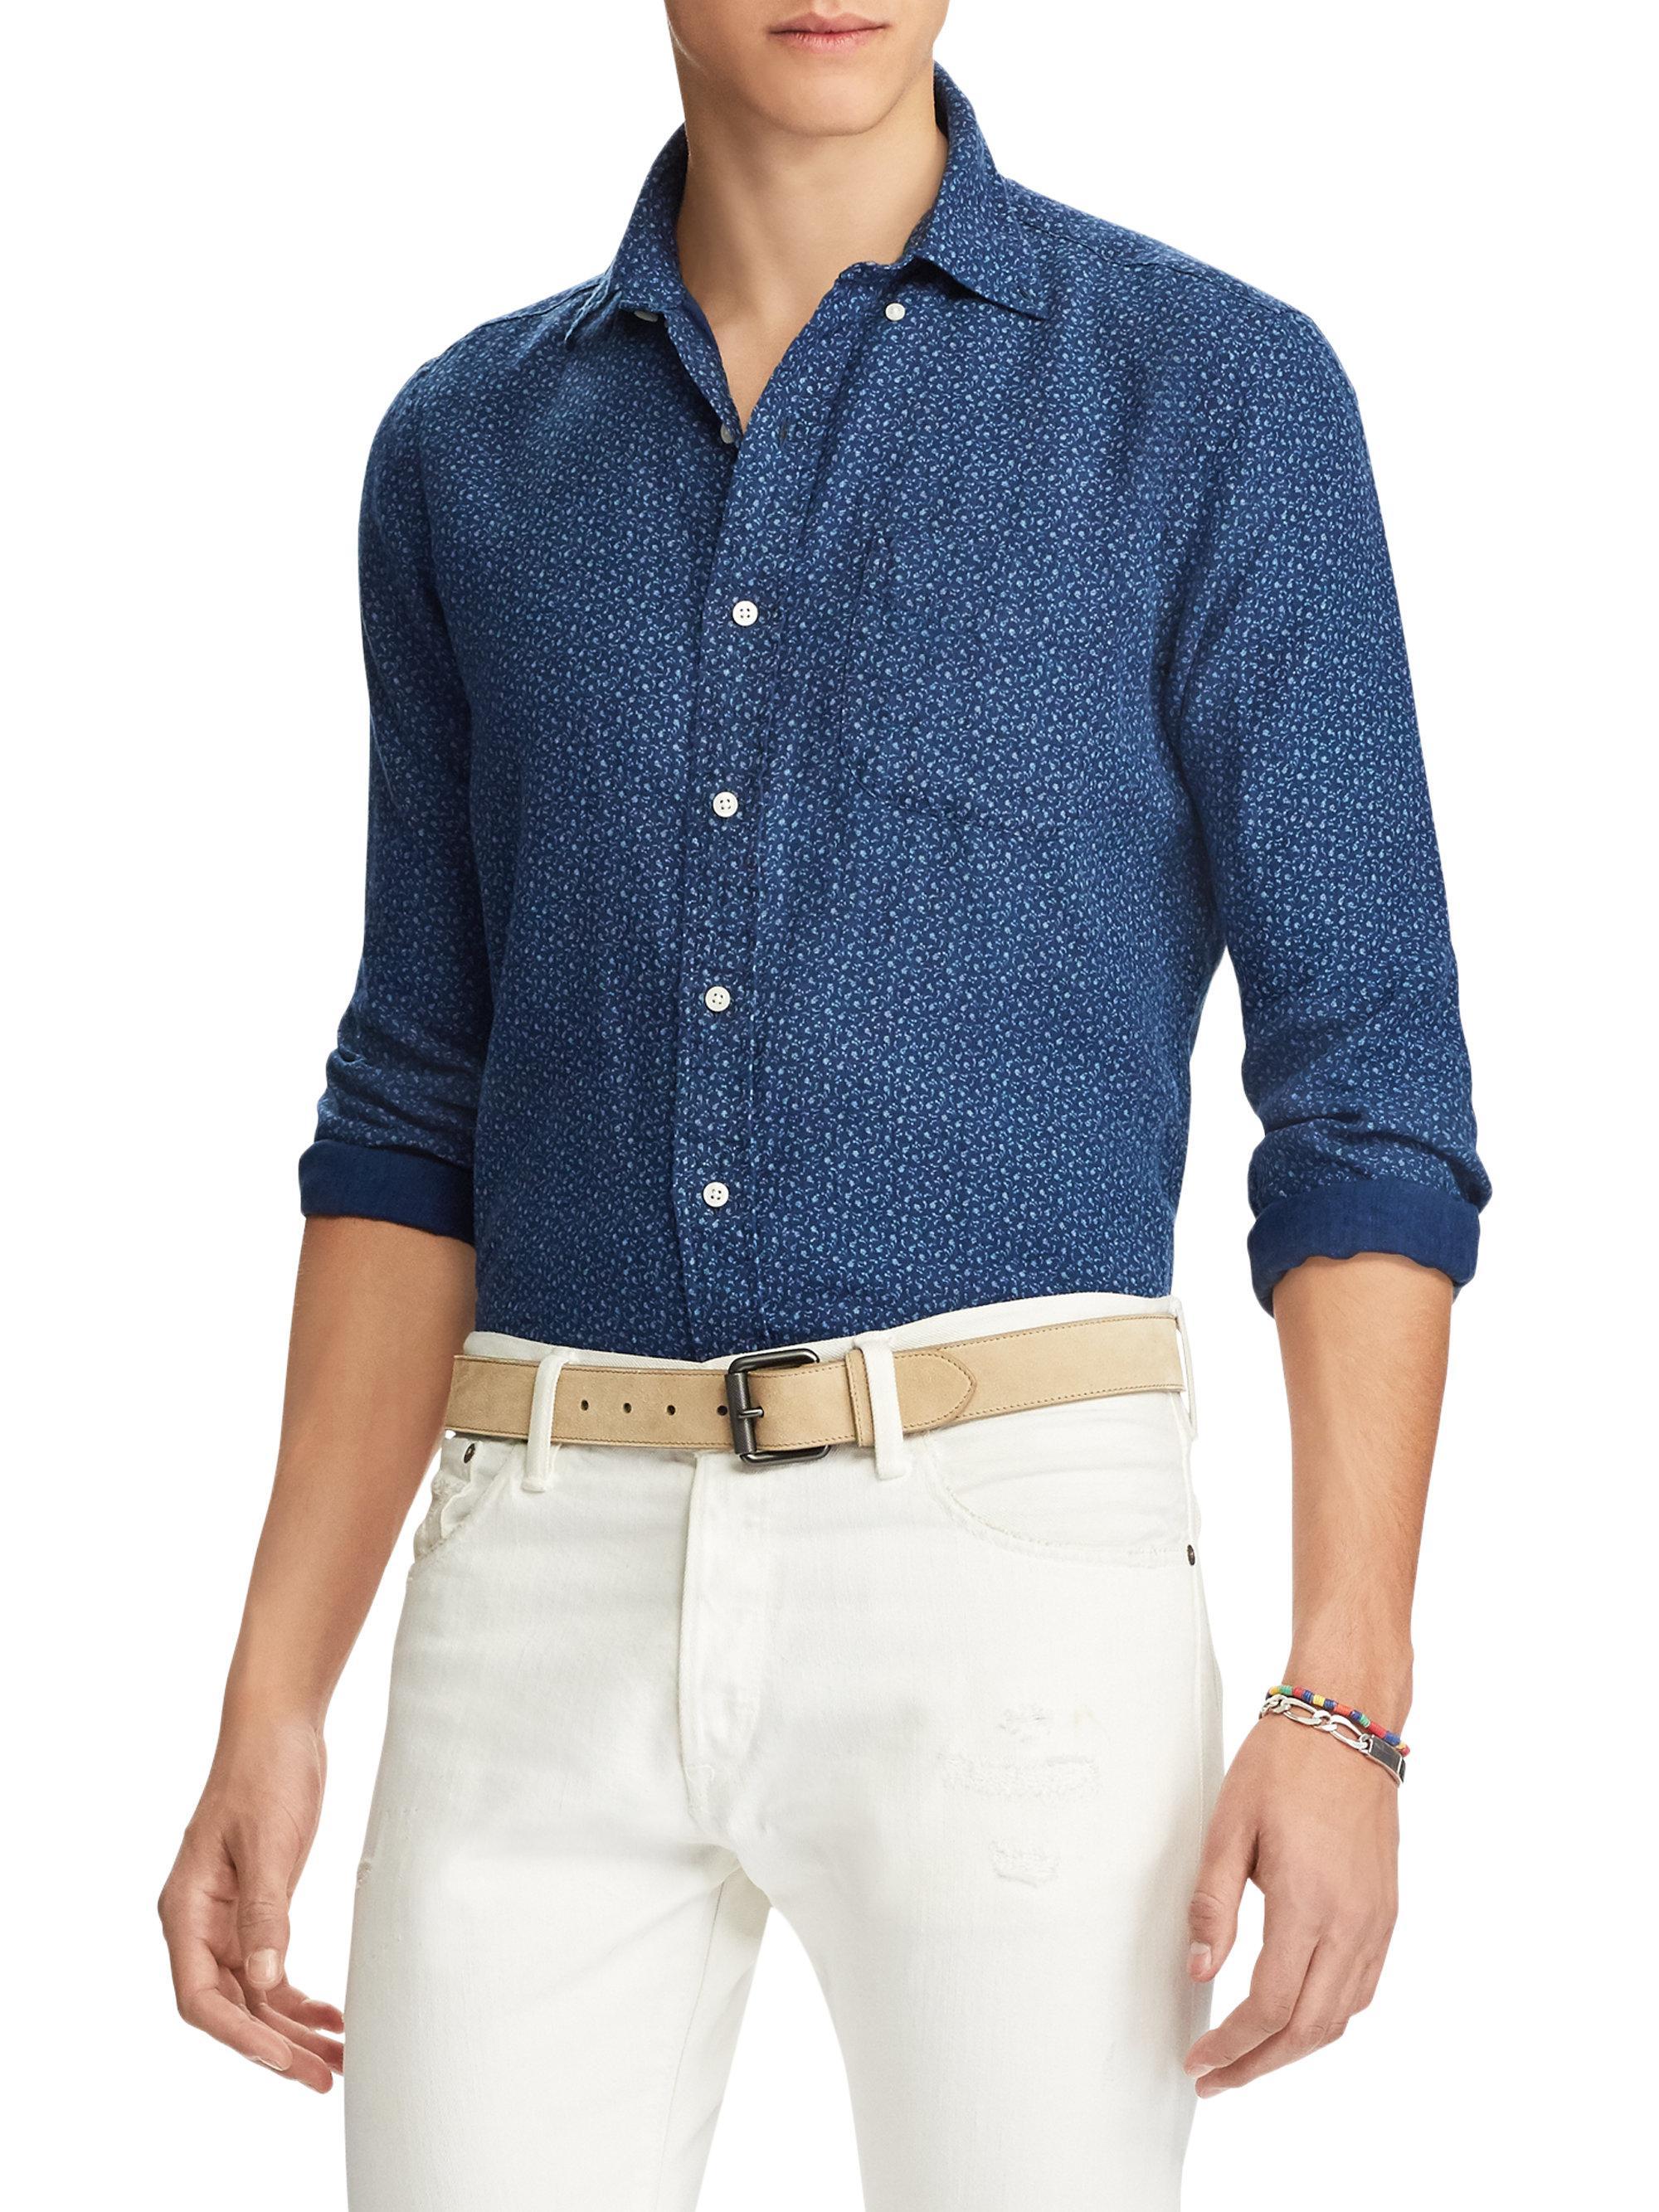 Polo ralph lauren linen mini floral casual button down for Polo ralph lauren casual button down shirts